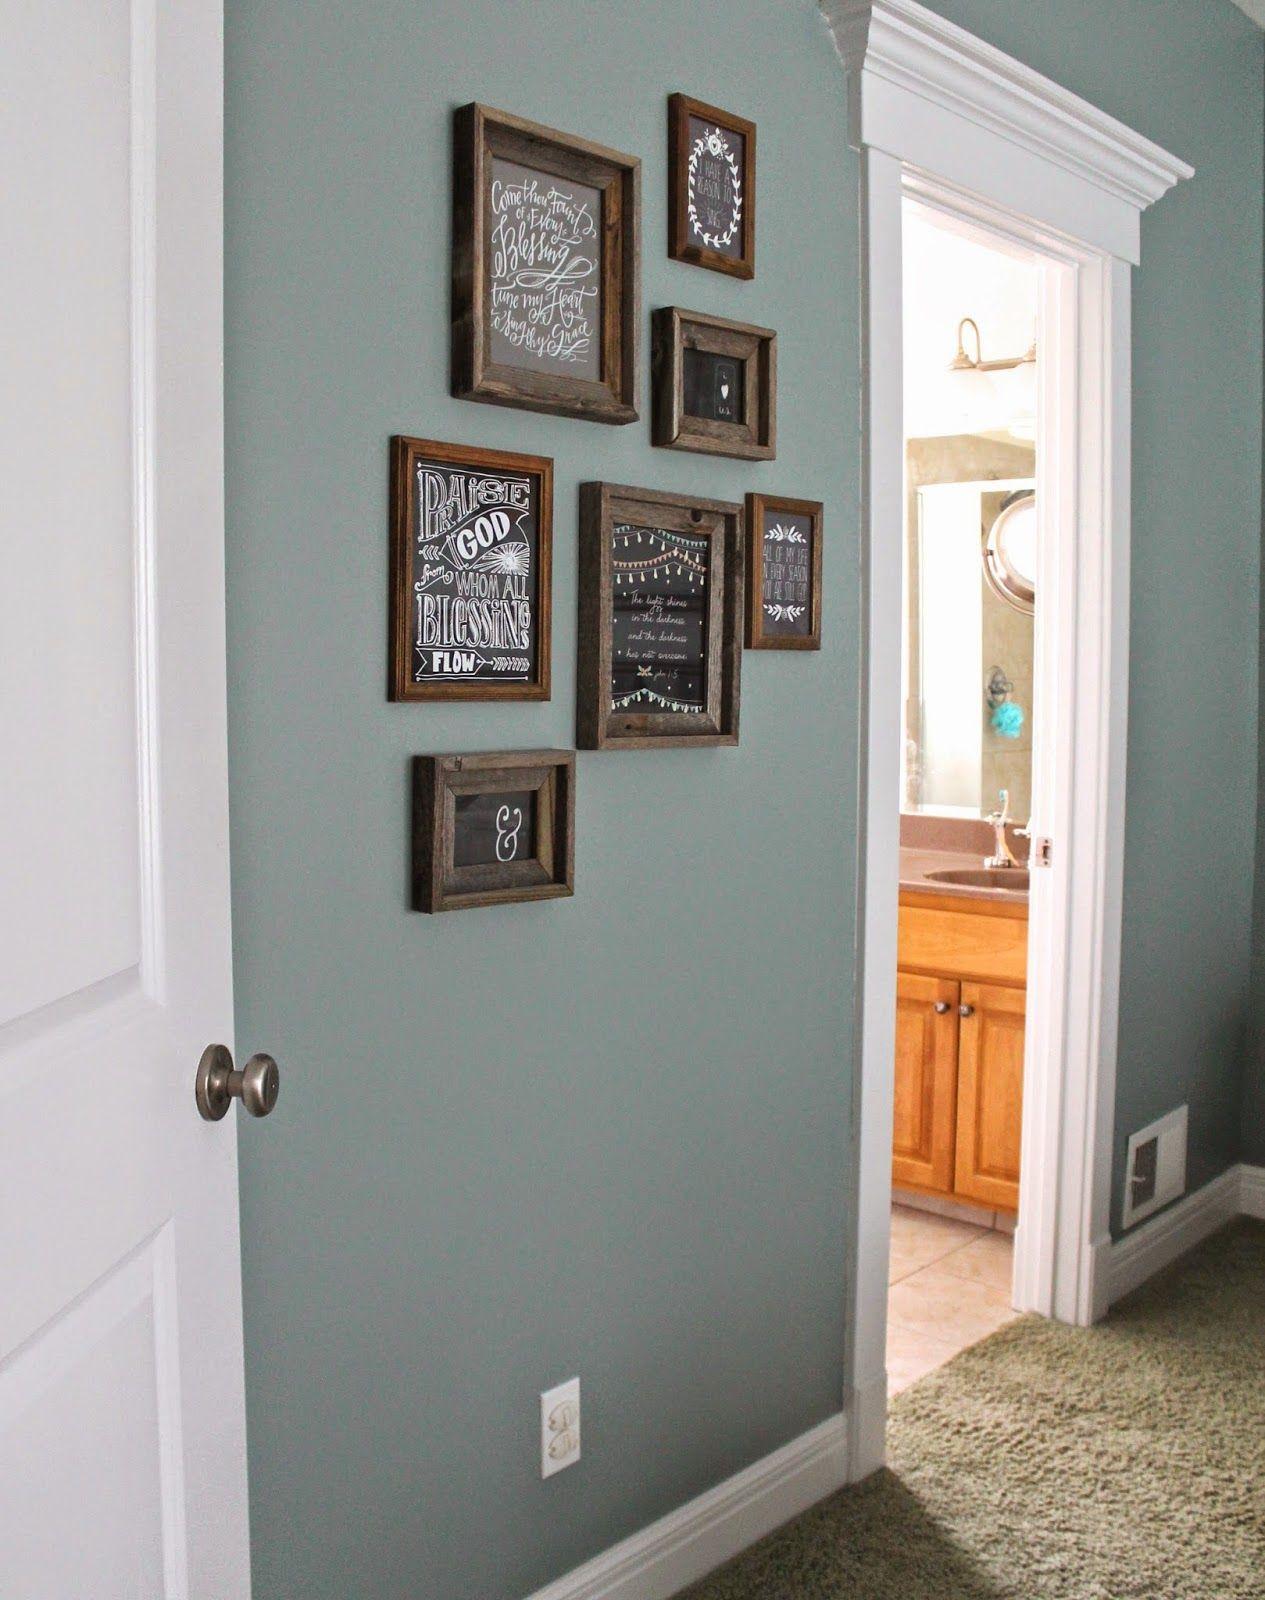 paint color: Valspar Blue Arrow dark rustic frames, Hobby